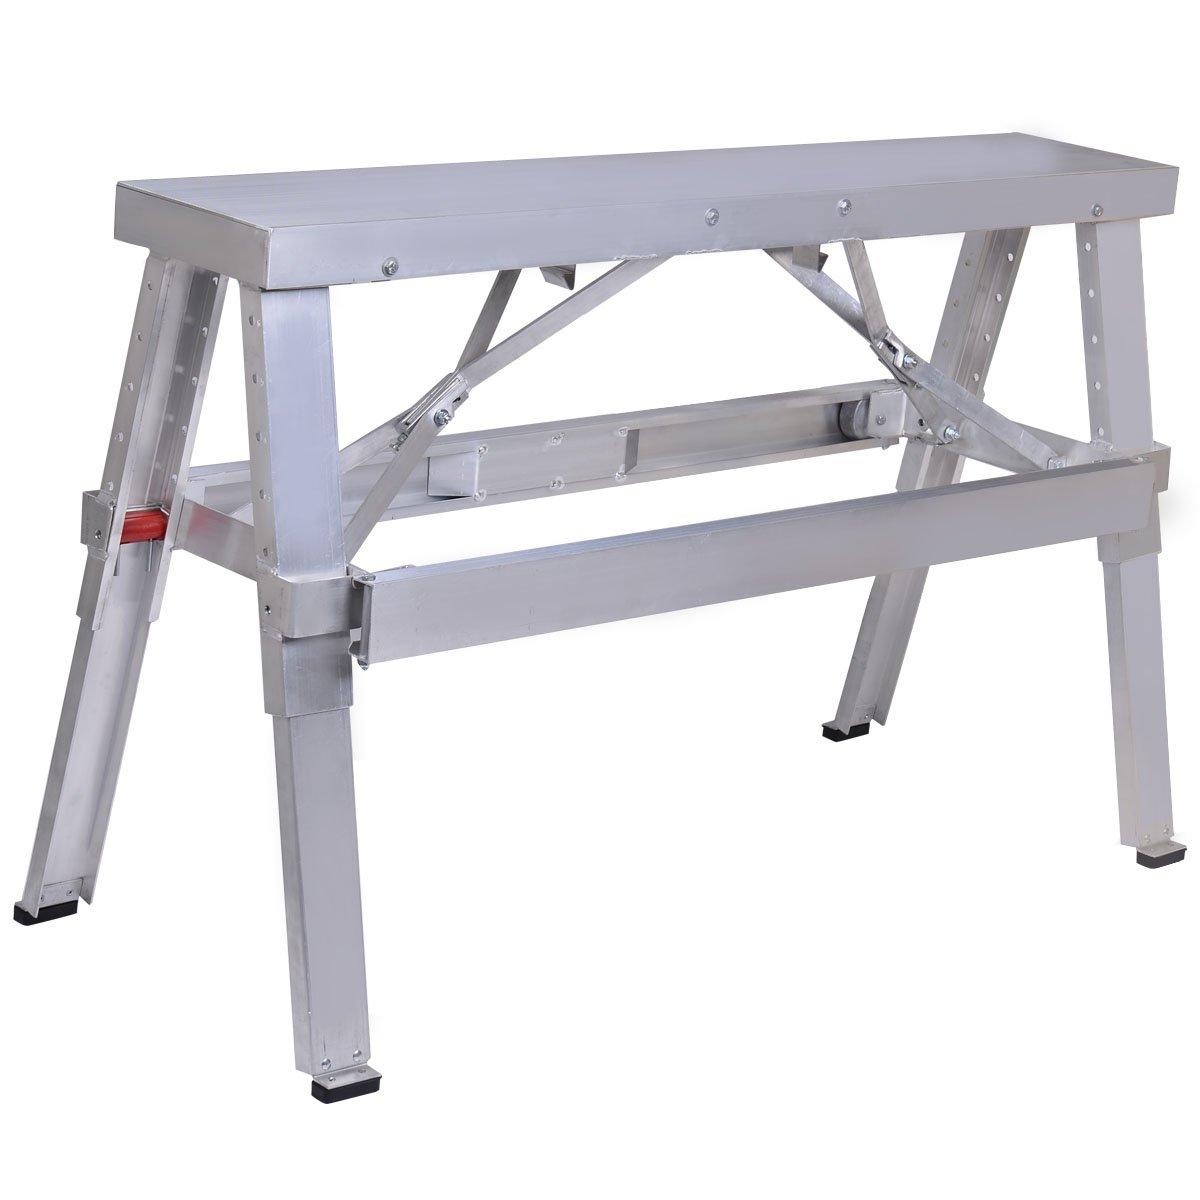 Toolsempire Aluminum Drywall Walk-Up Folding Bench Heavy Duty Workbench Adjustable 18''-30''